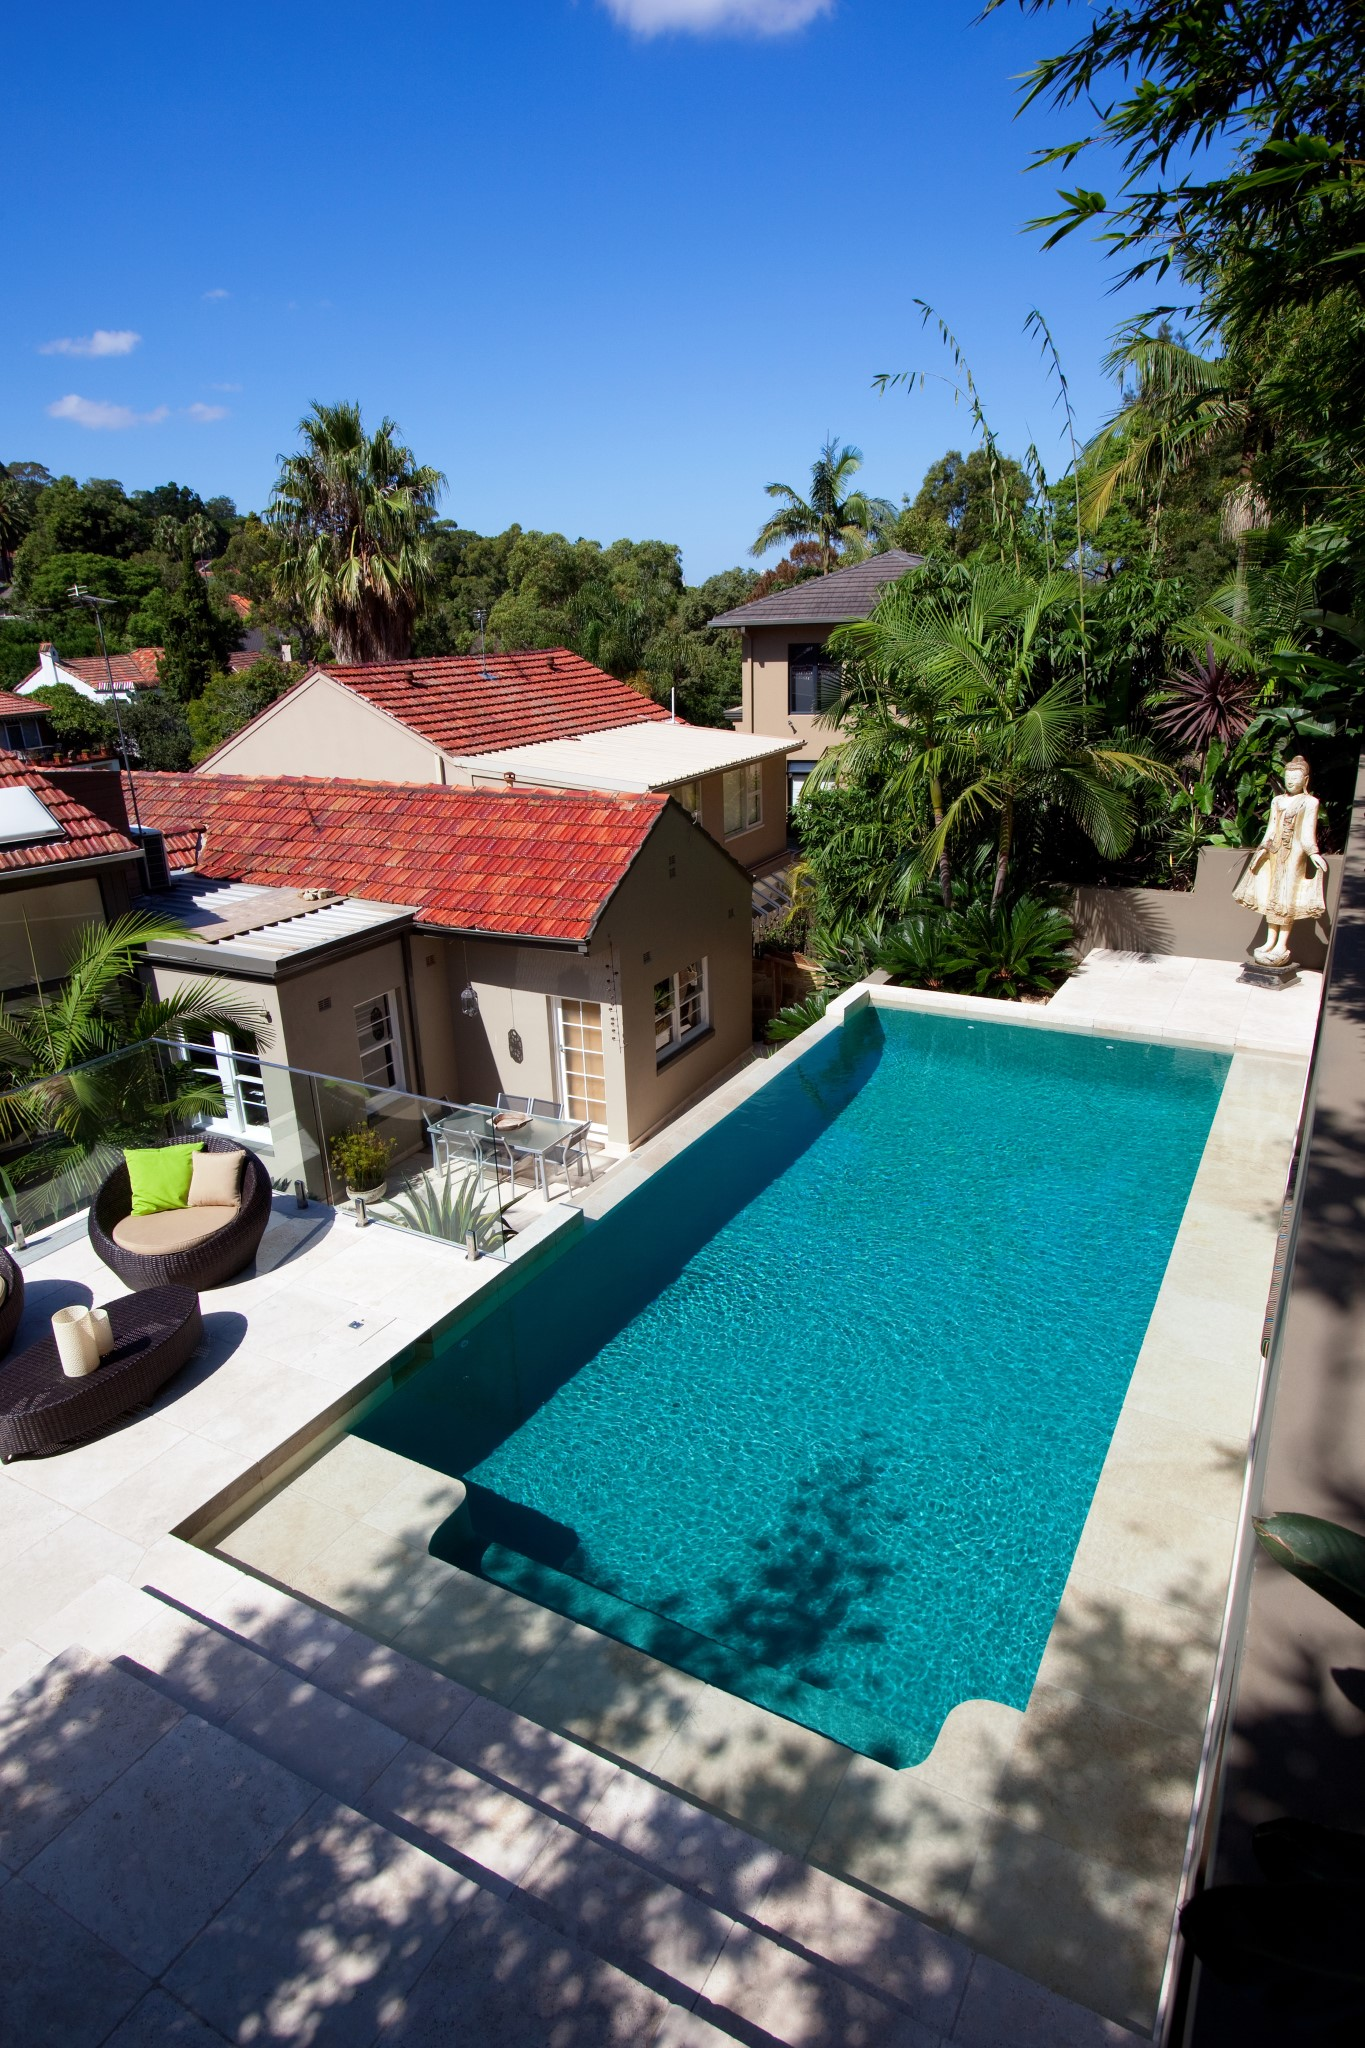 Classic Design Swimming Pool of Premier Pools